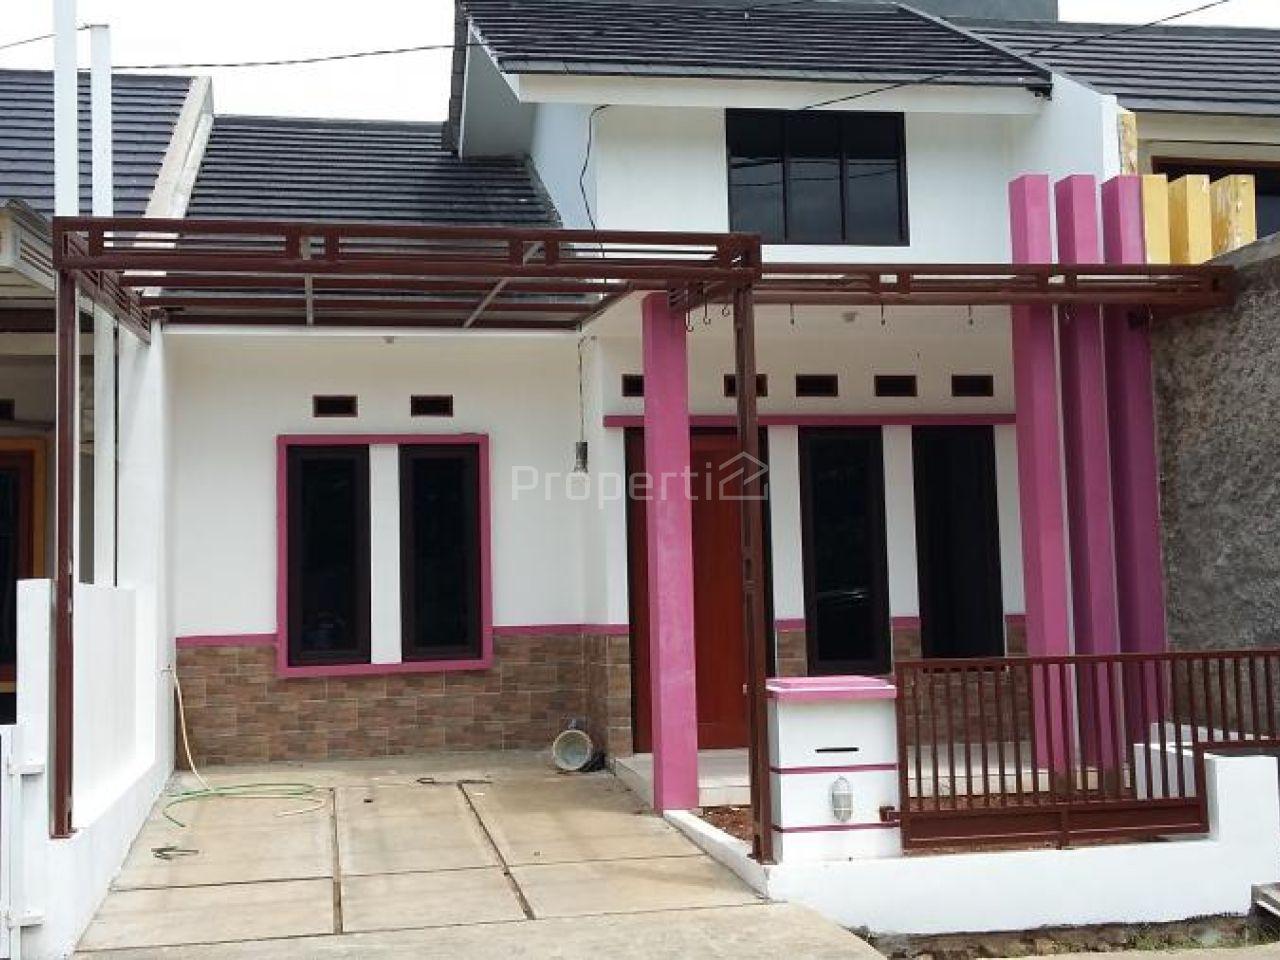 Rumah Baru di Perumahan RAFFLES REGENCY, Jawa Barat